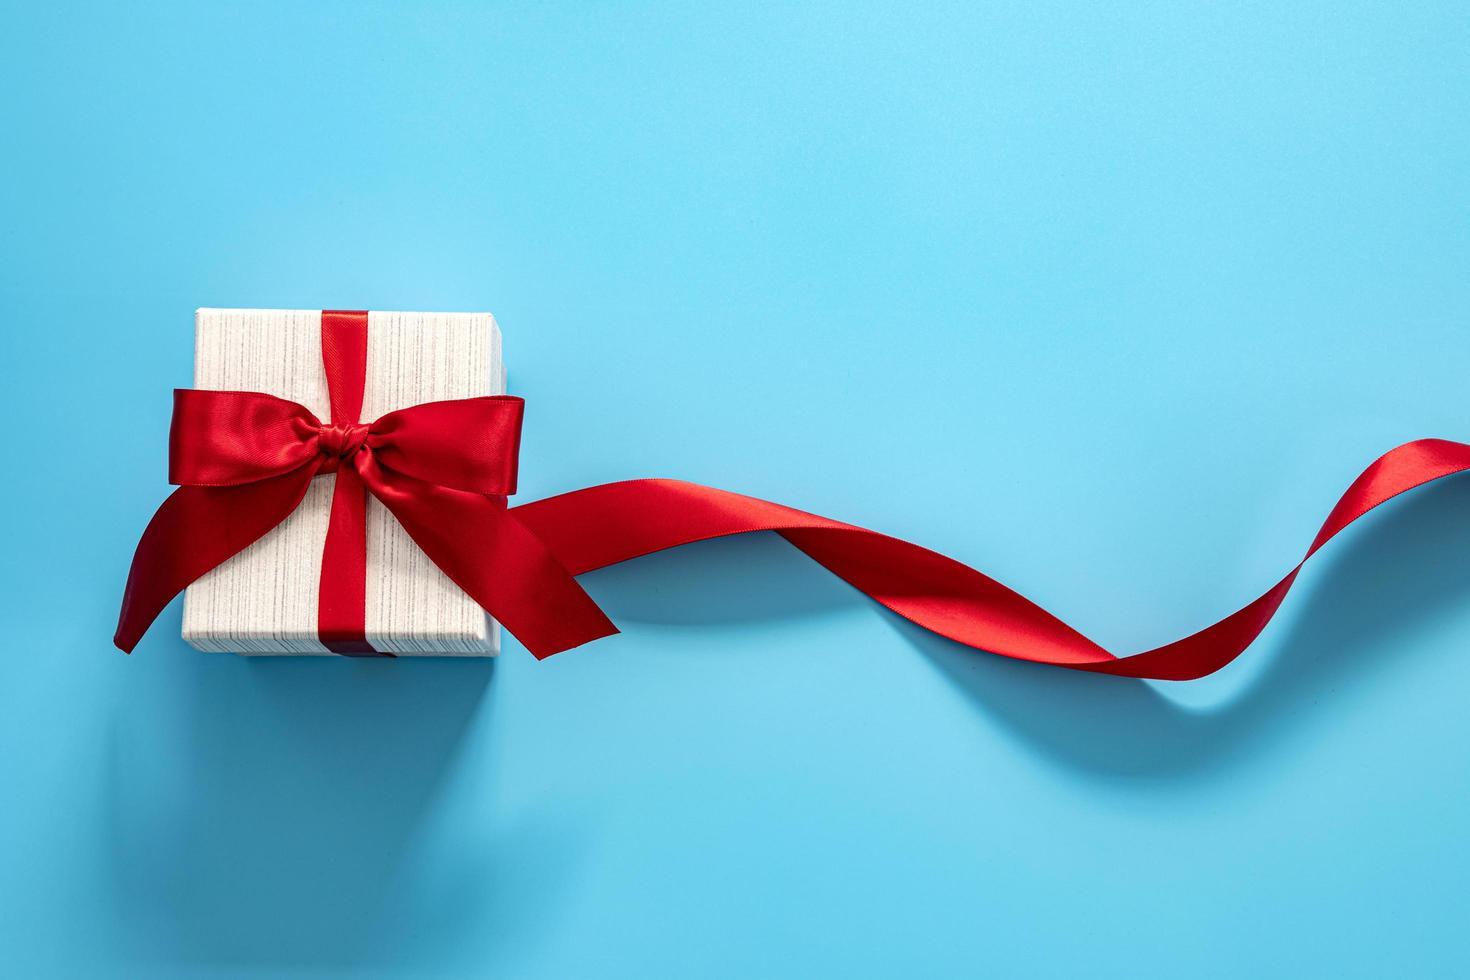 Caja de regalo con lazo rojo sobre fondo azul. foto